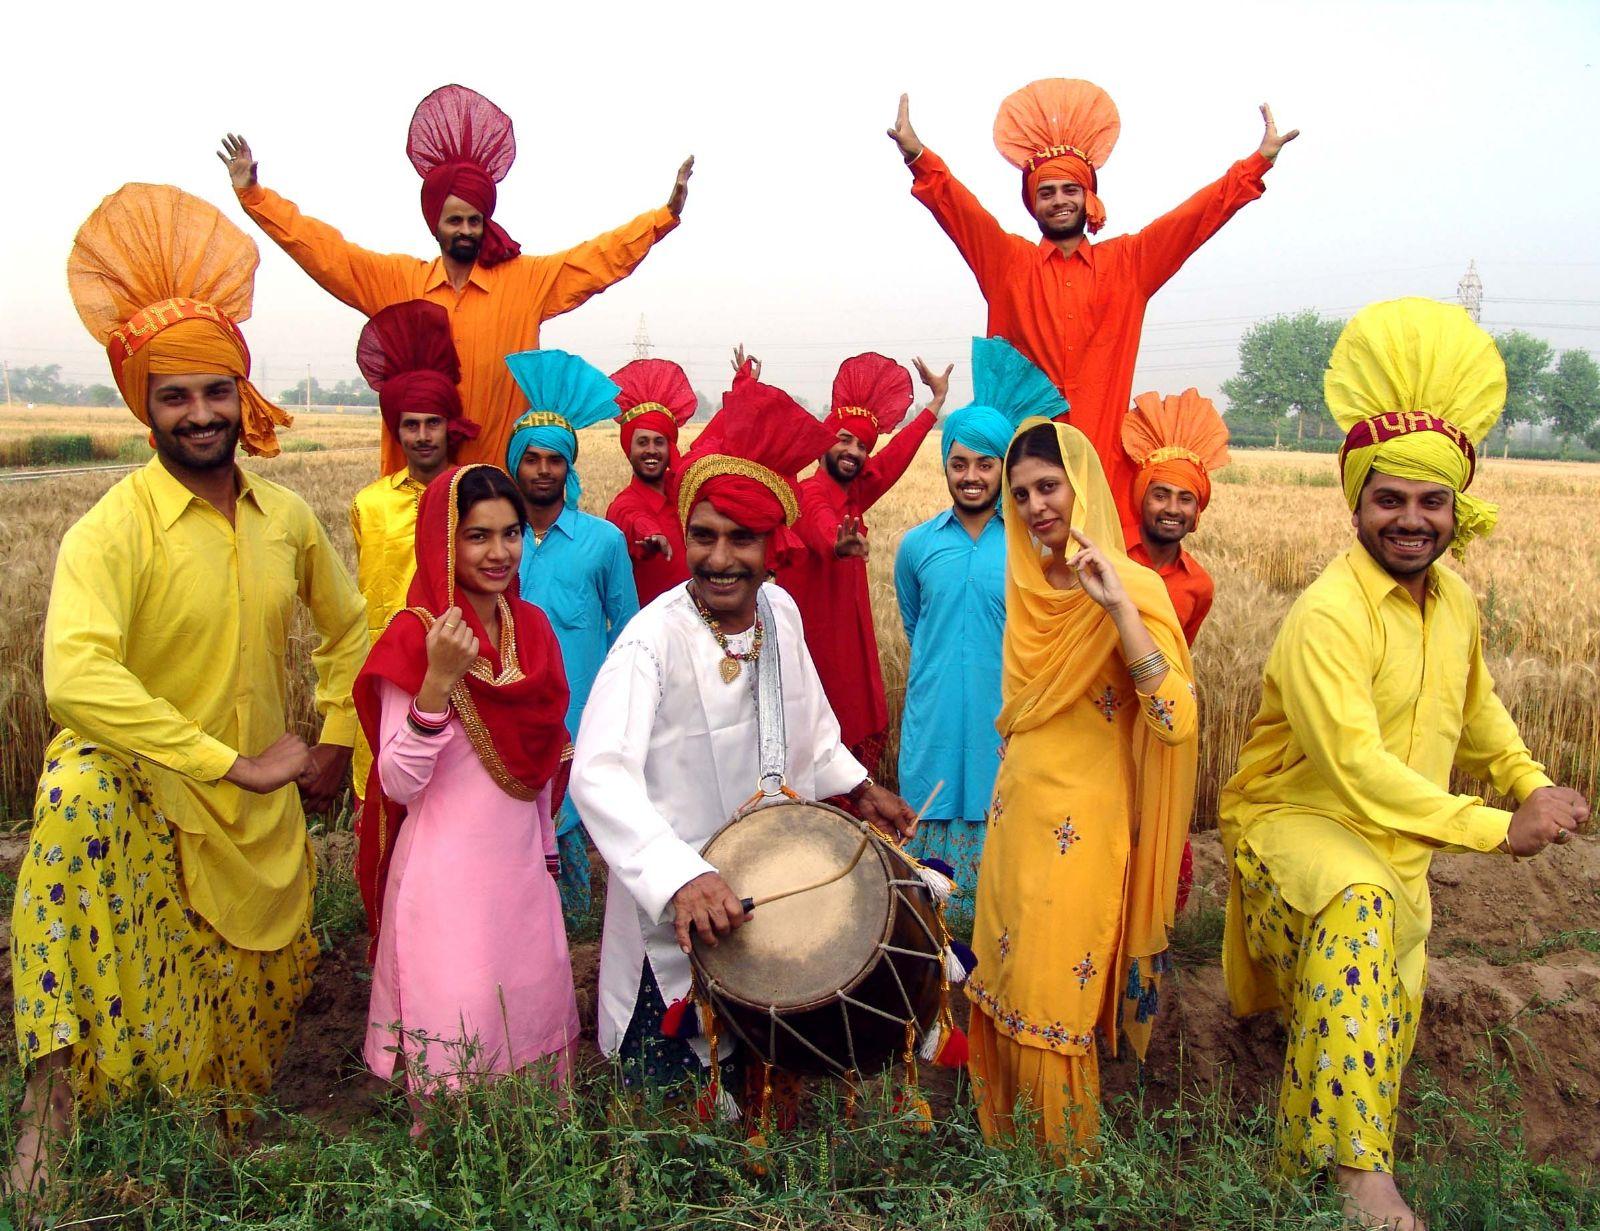 Bailarines de Danza Bhangra